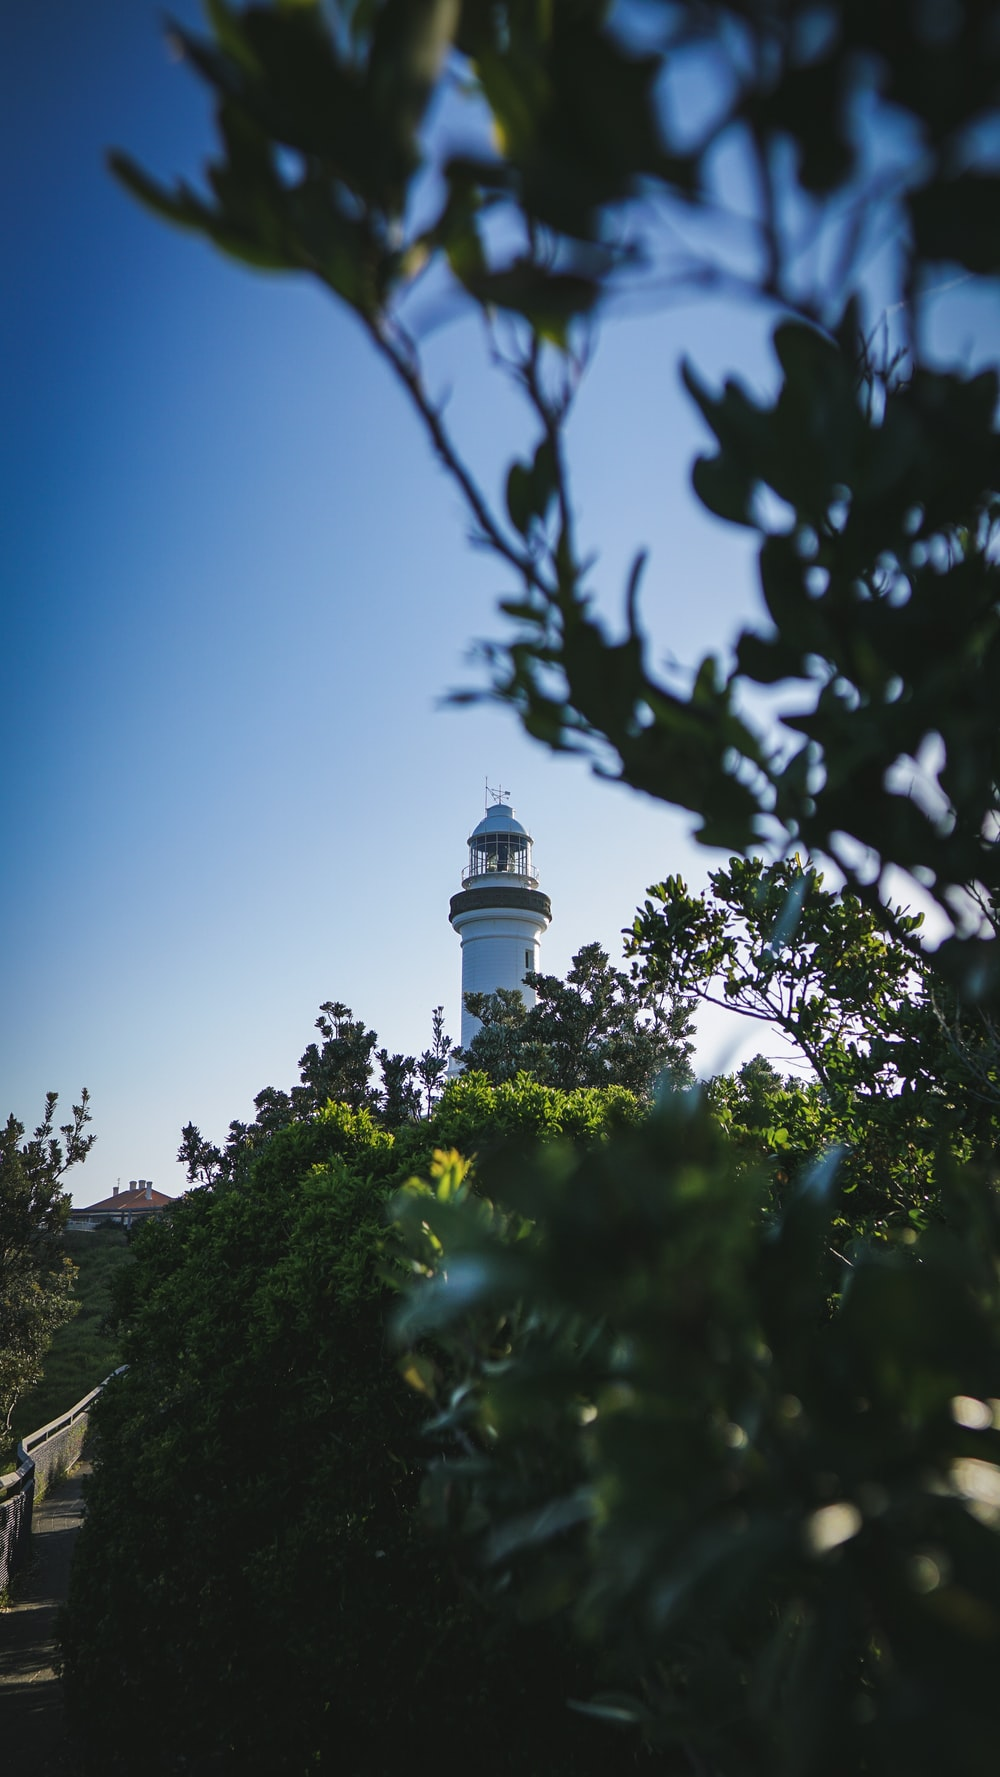 white watch tower